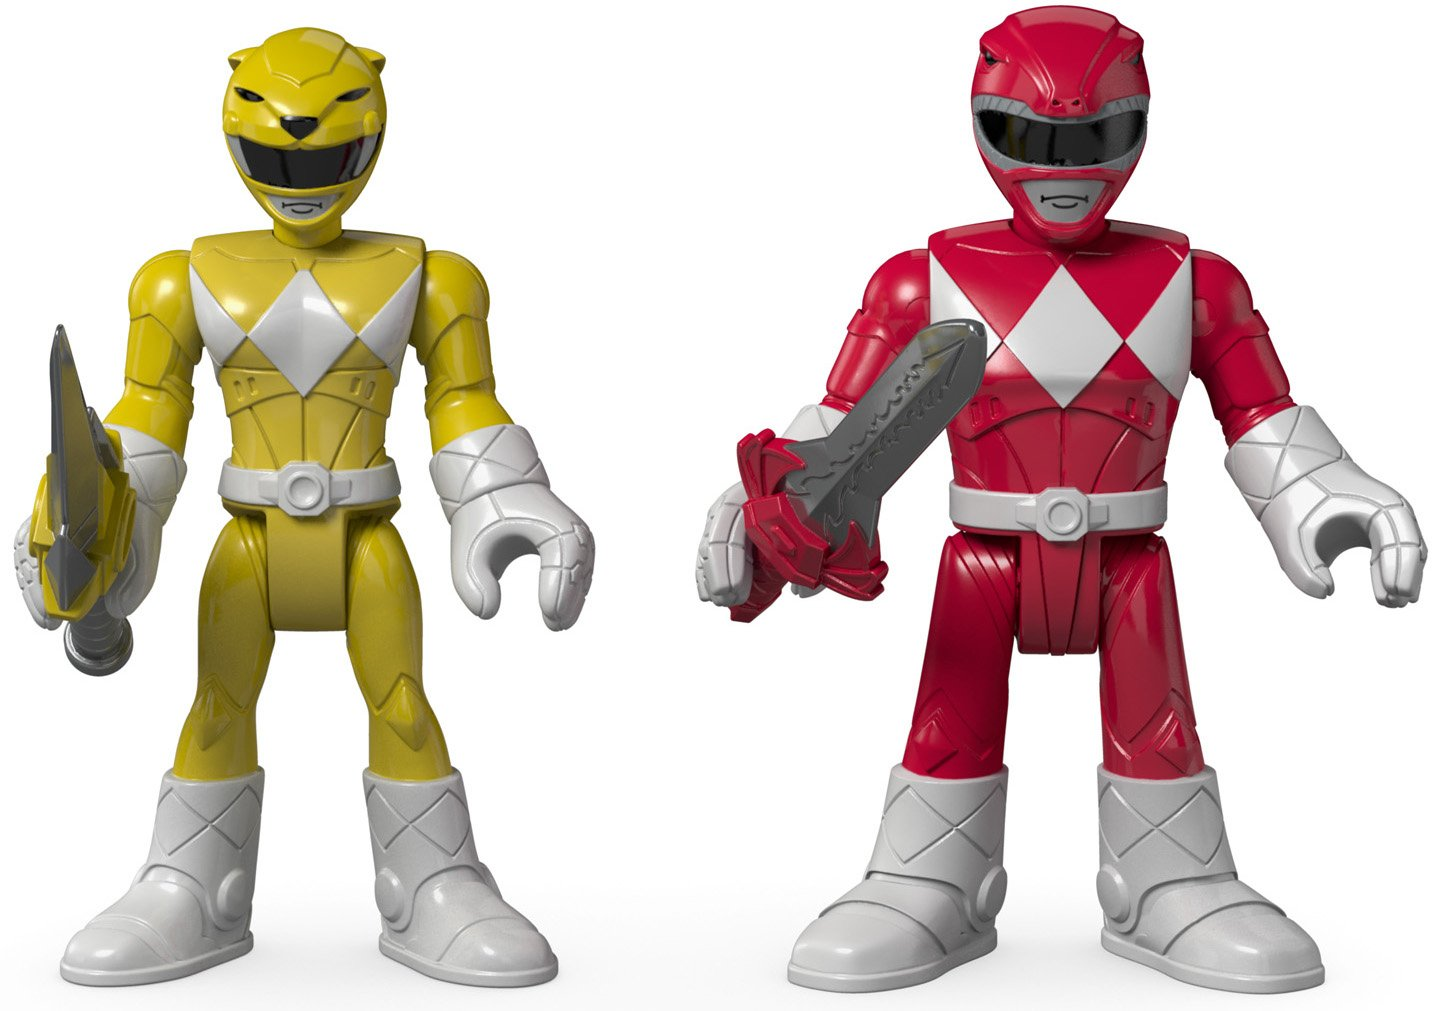 Fisher-Price Imaginext Power Rangers Red Ranger & Yellow Ranger